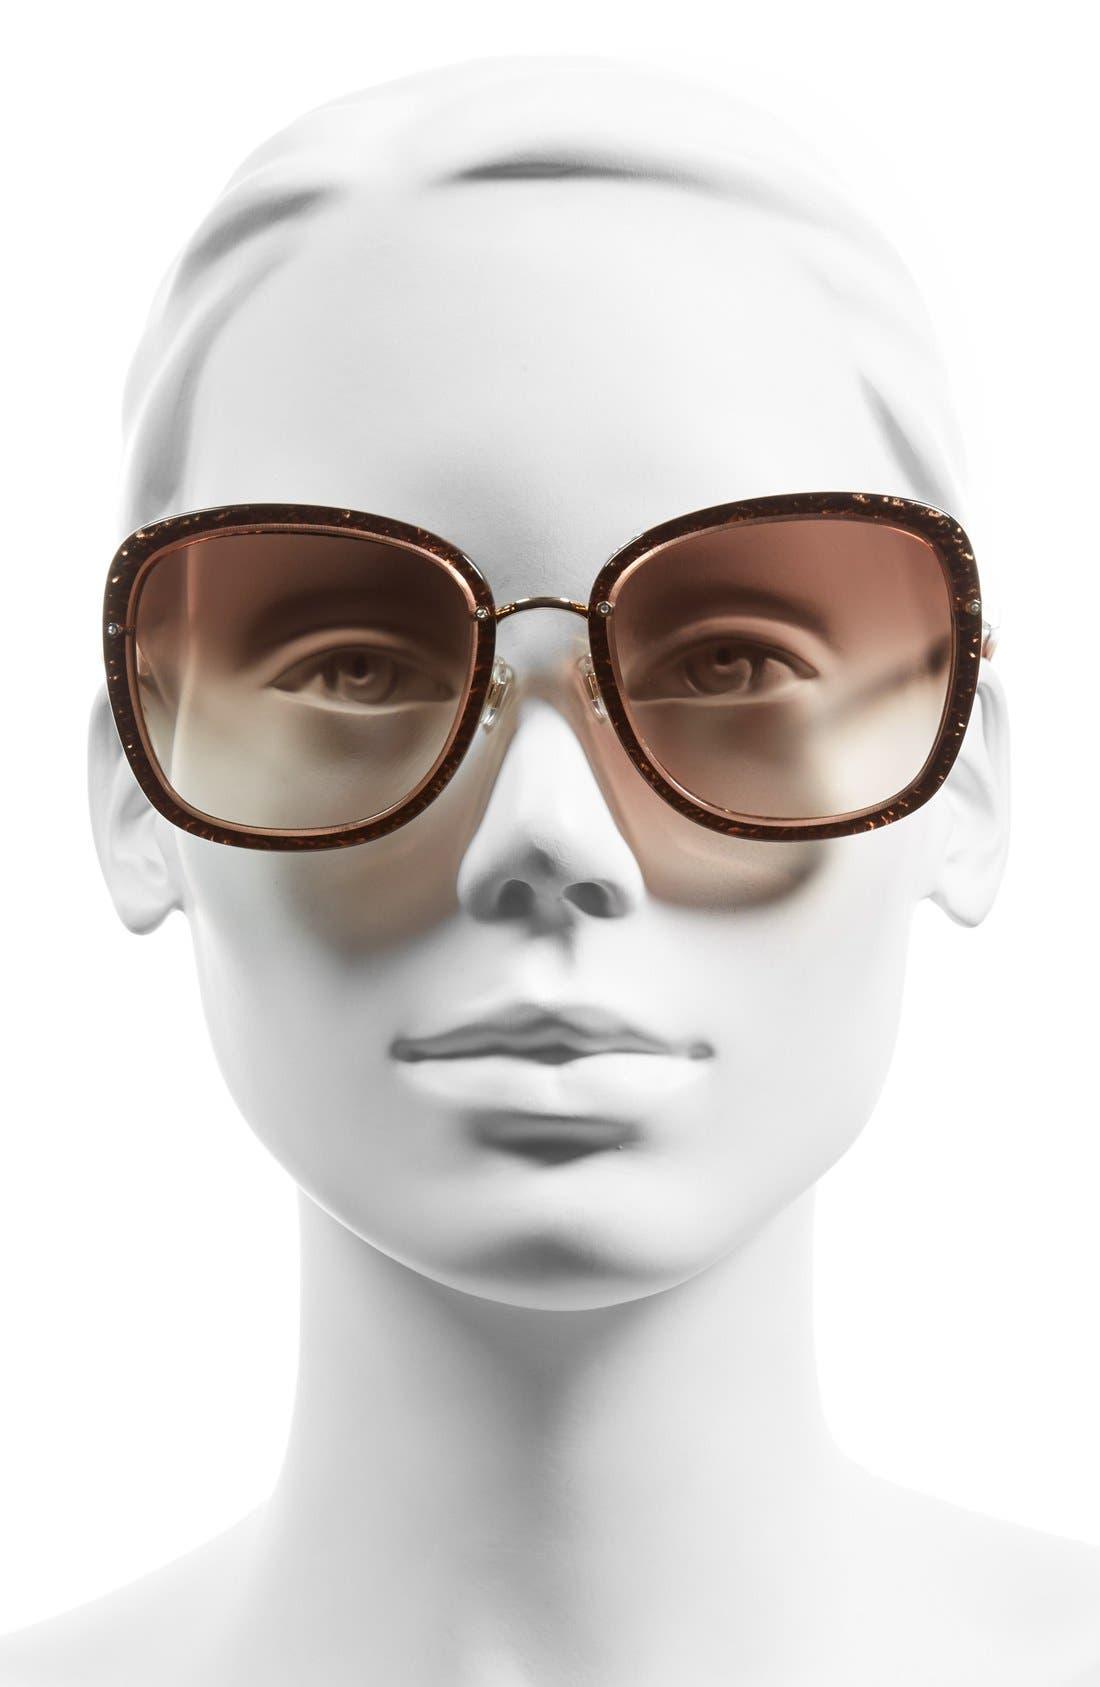 KATE SPADE NEW YORK,                             'scottie' 56mm retro sunglasses,                             Alternate thumbnail 2, color,                             200